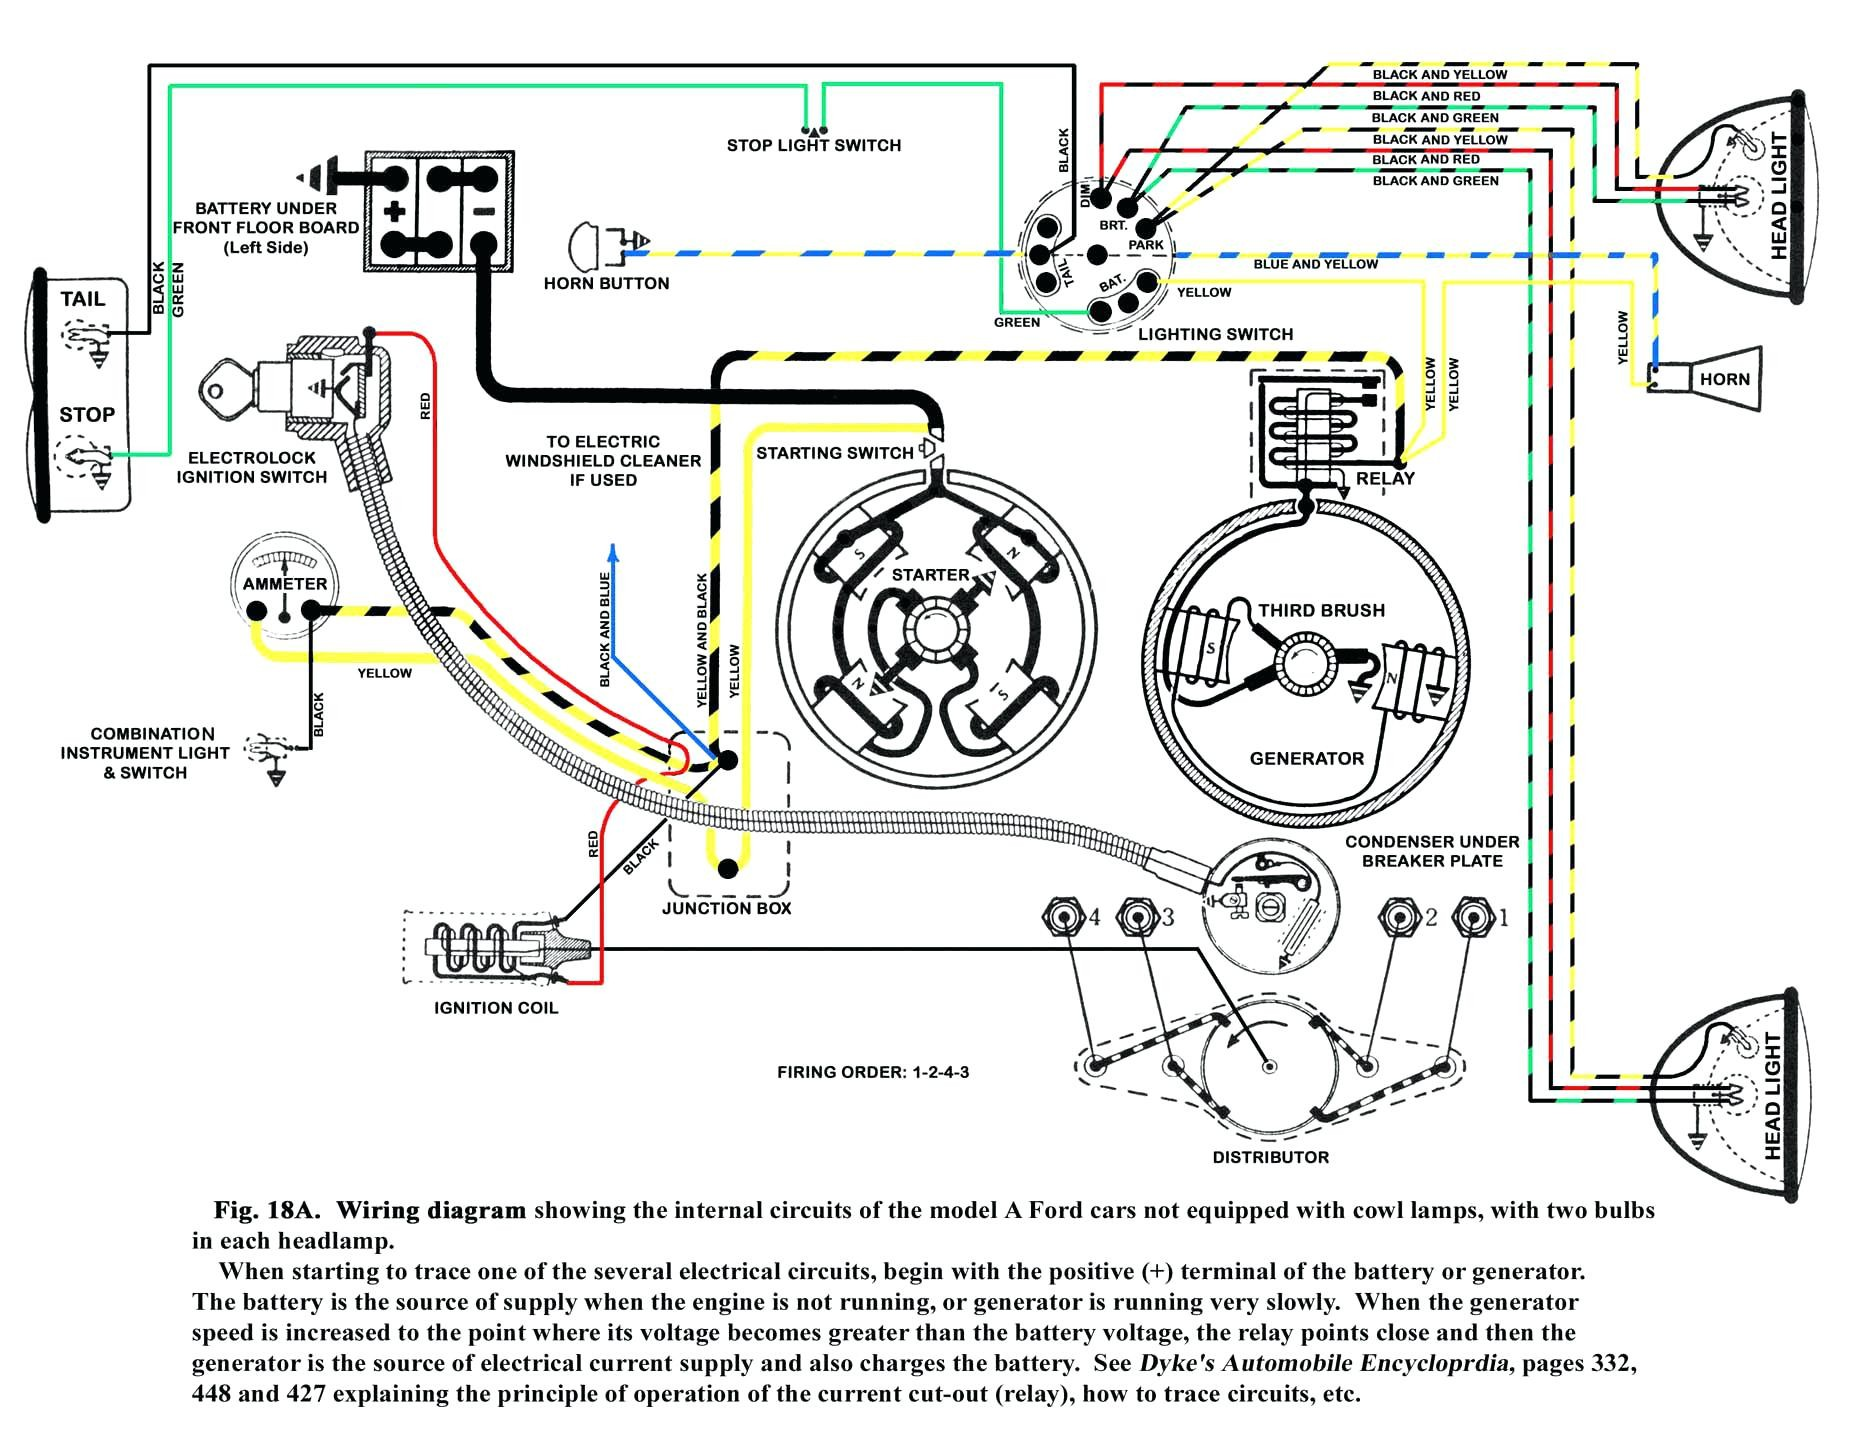 John Deere 4020 12 Volt Wiring Diagram Elegant | Wiring ...